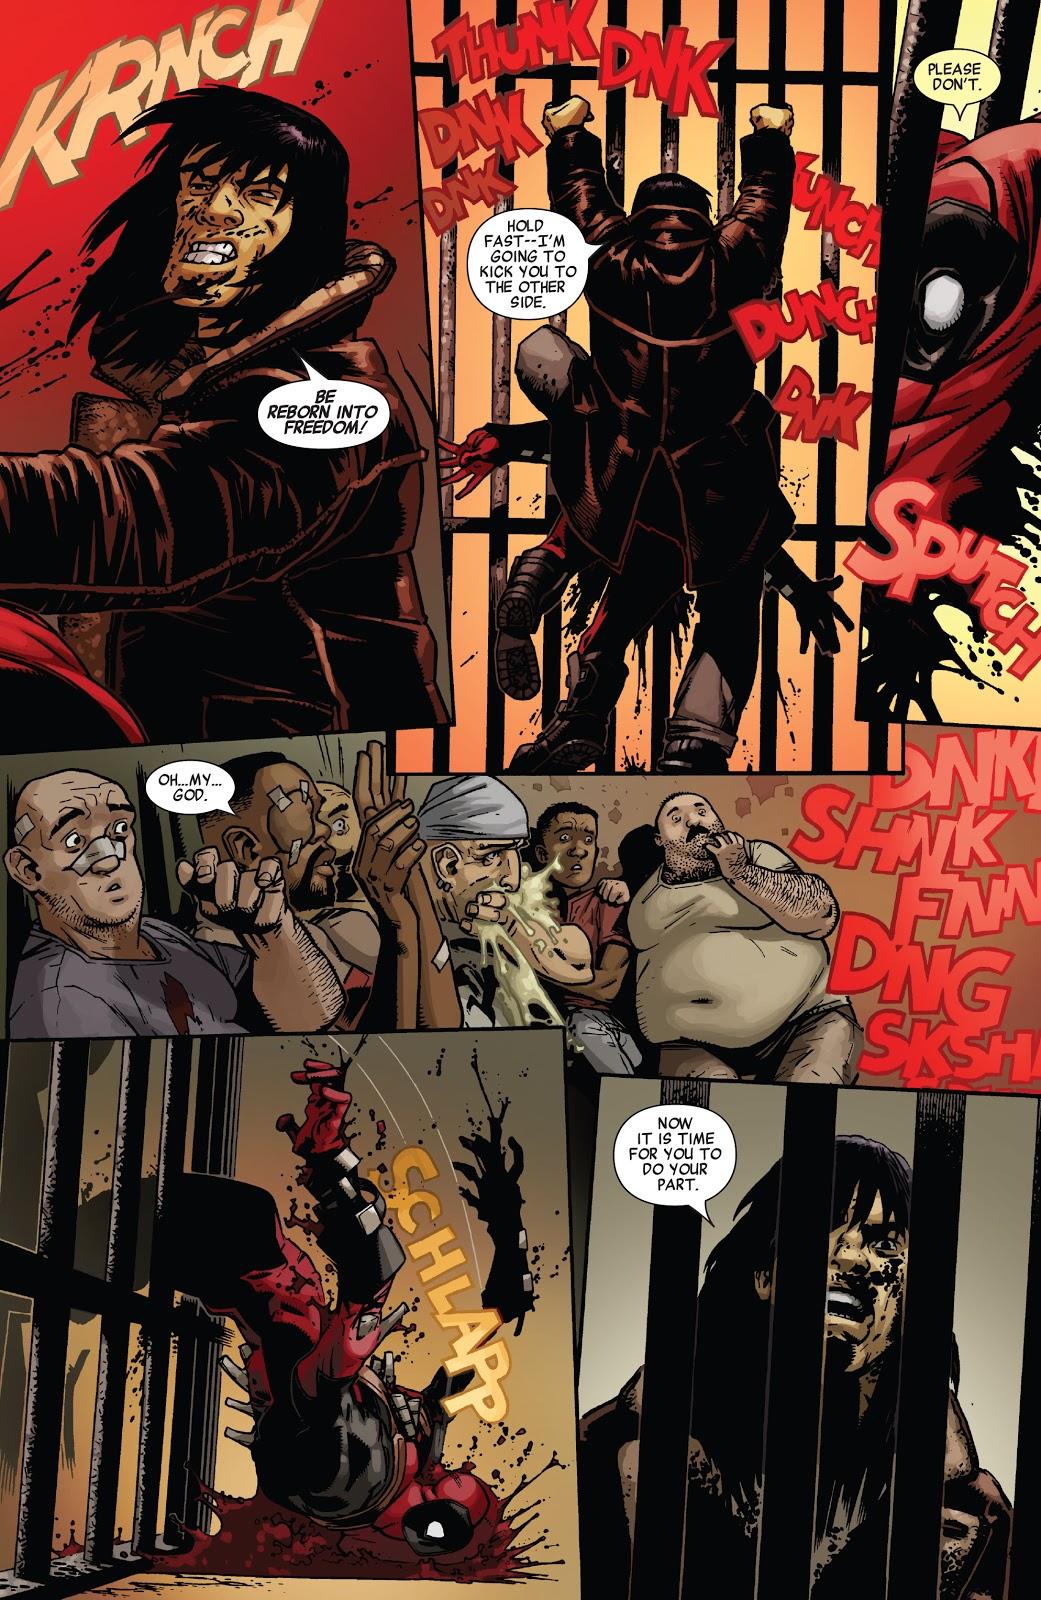 Conan The Barbarian Meets Deadpool